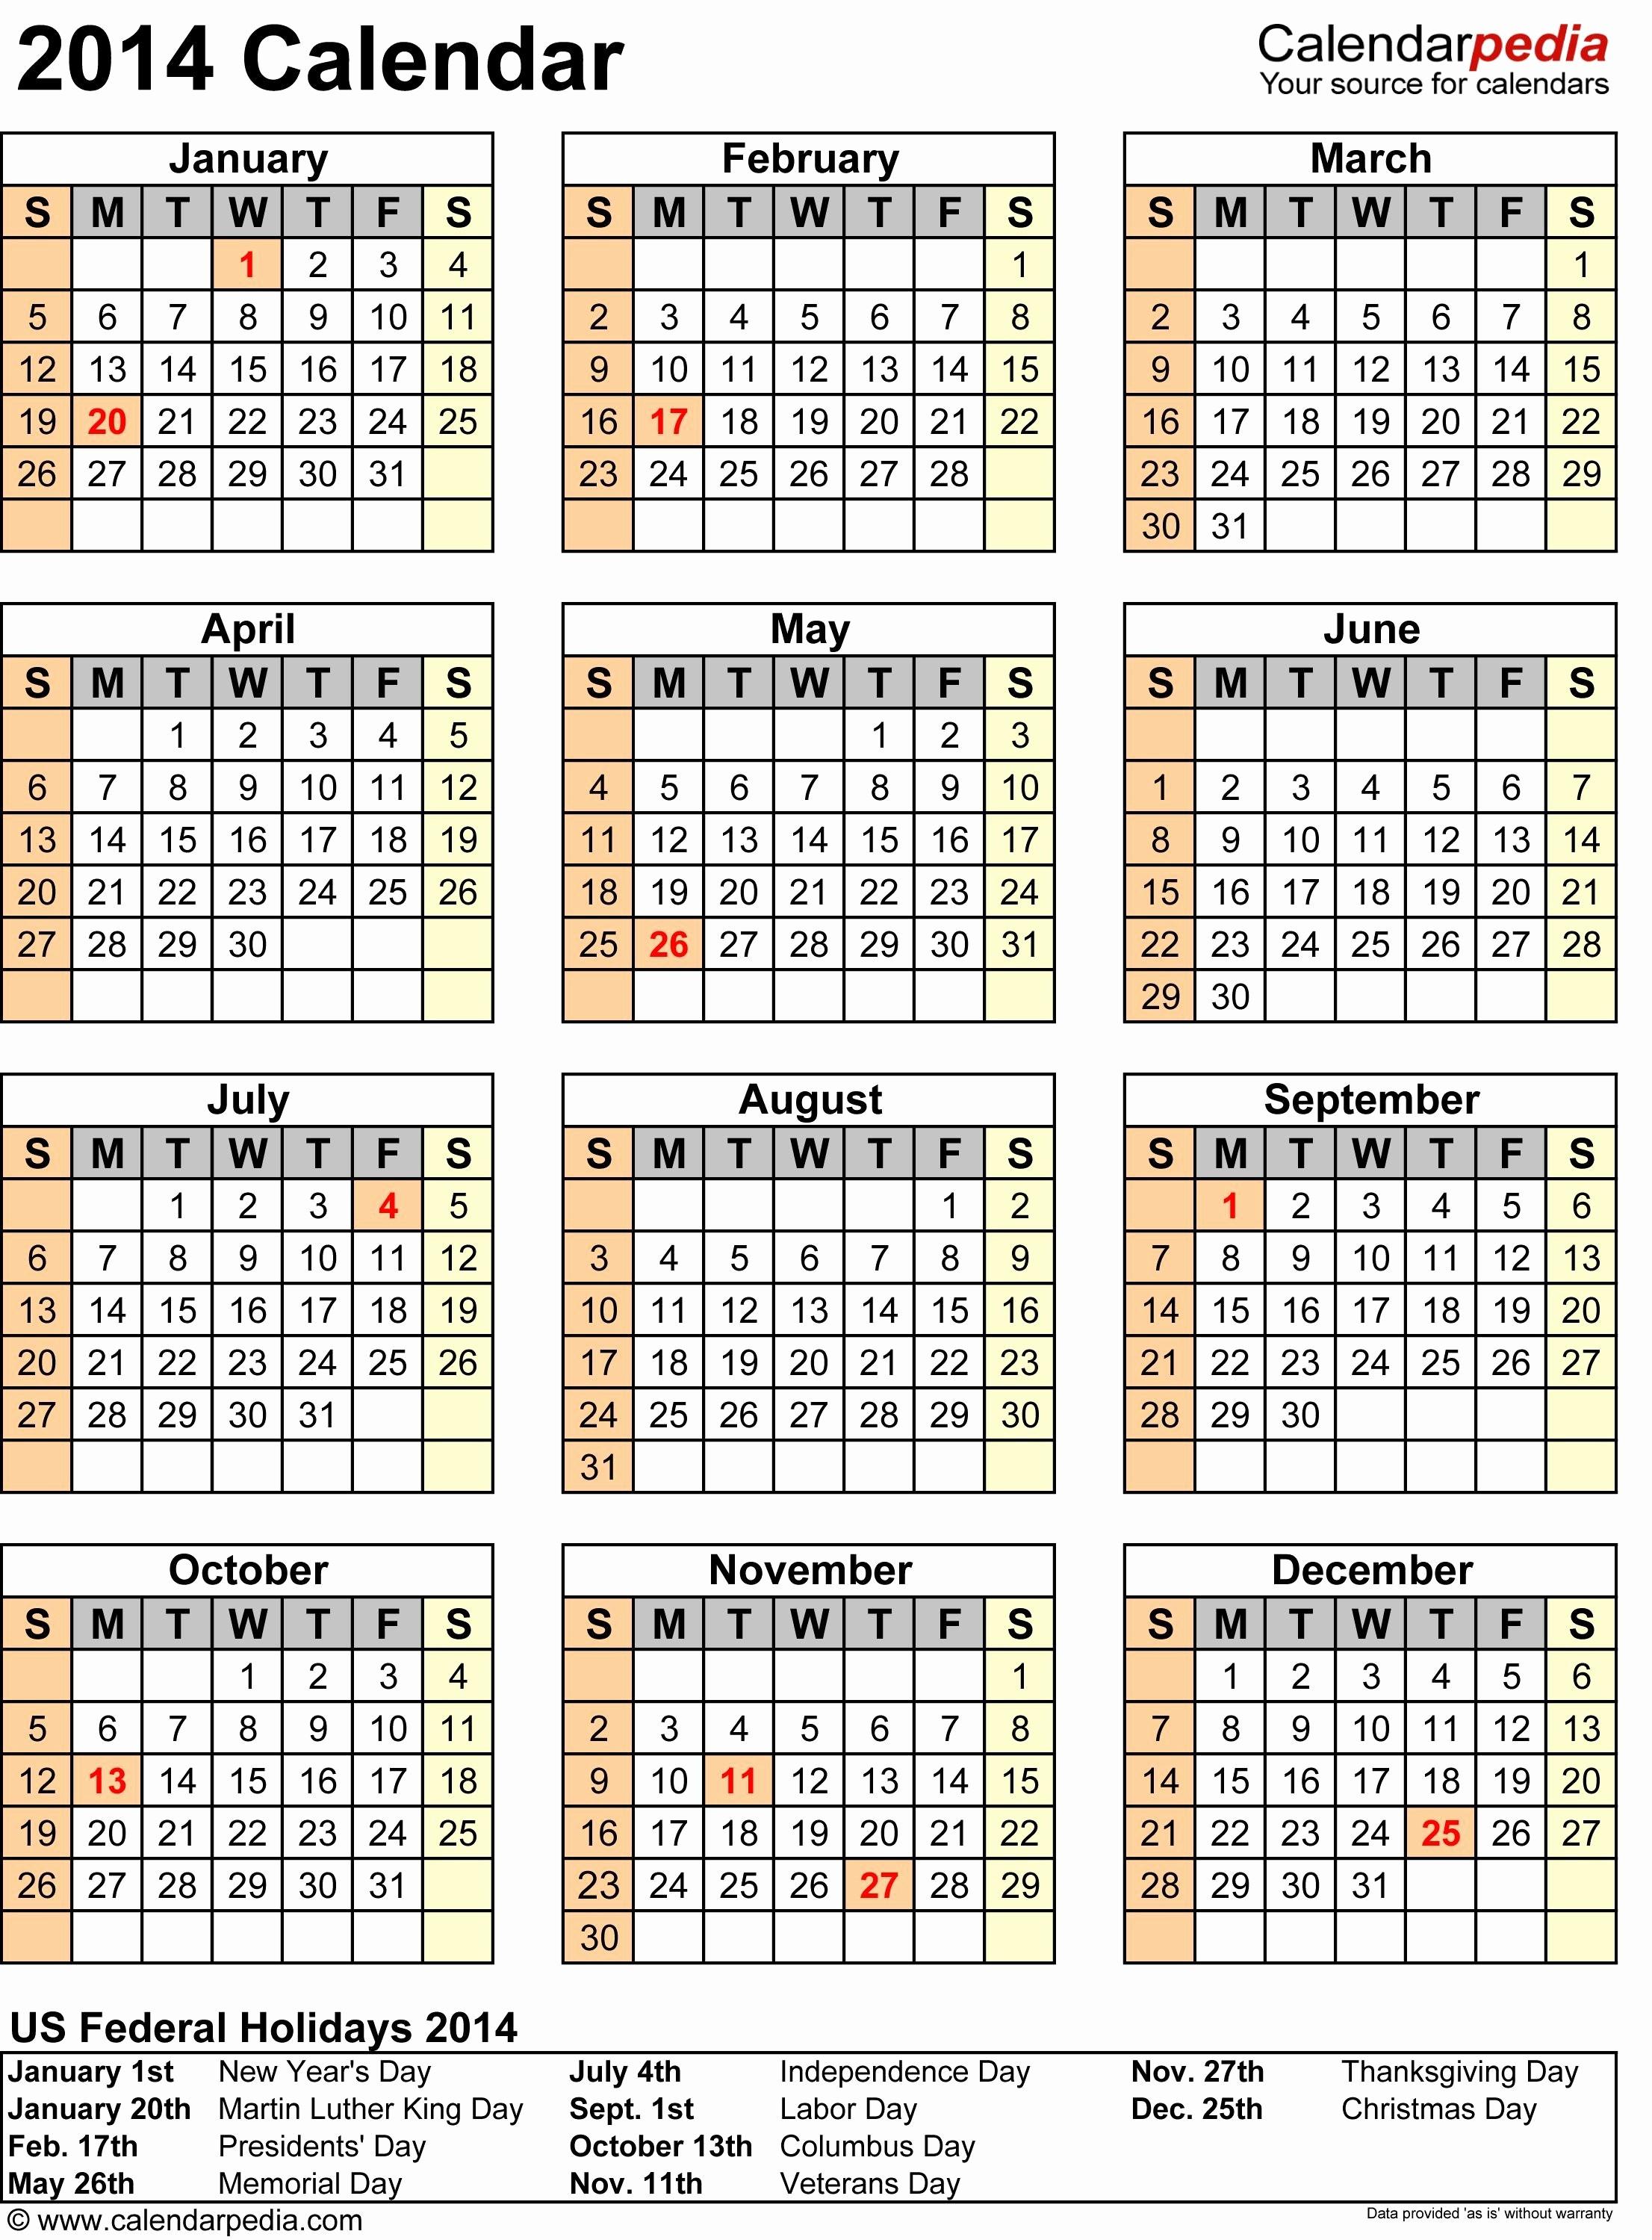 Excel 2017 Calendar with Holidays Elegant 2014 Calendar Template with Holidays